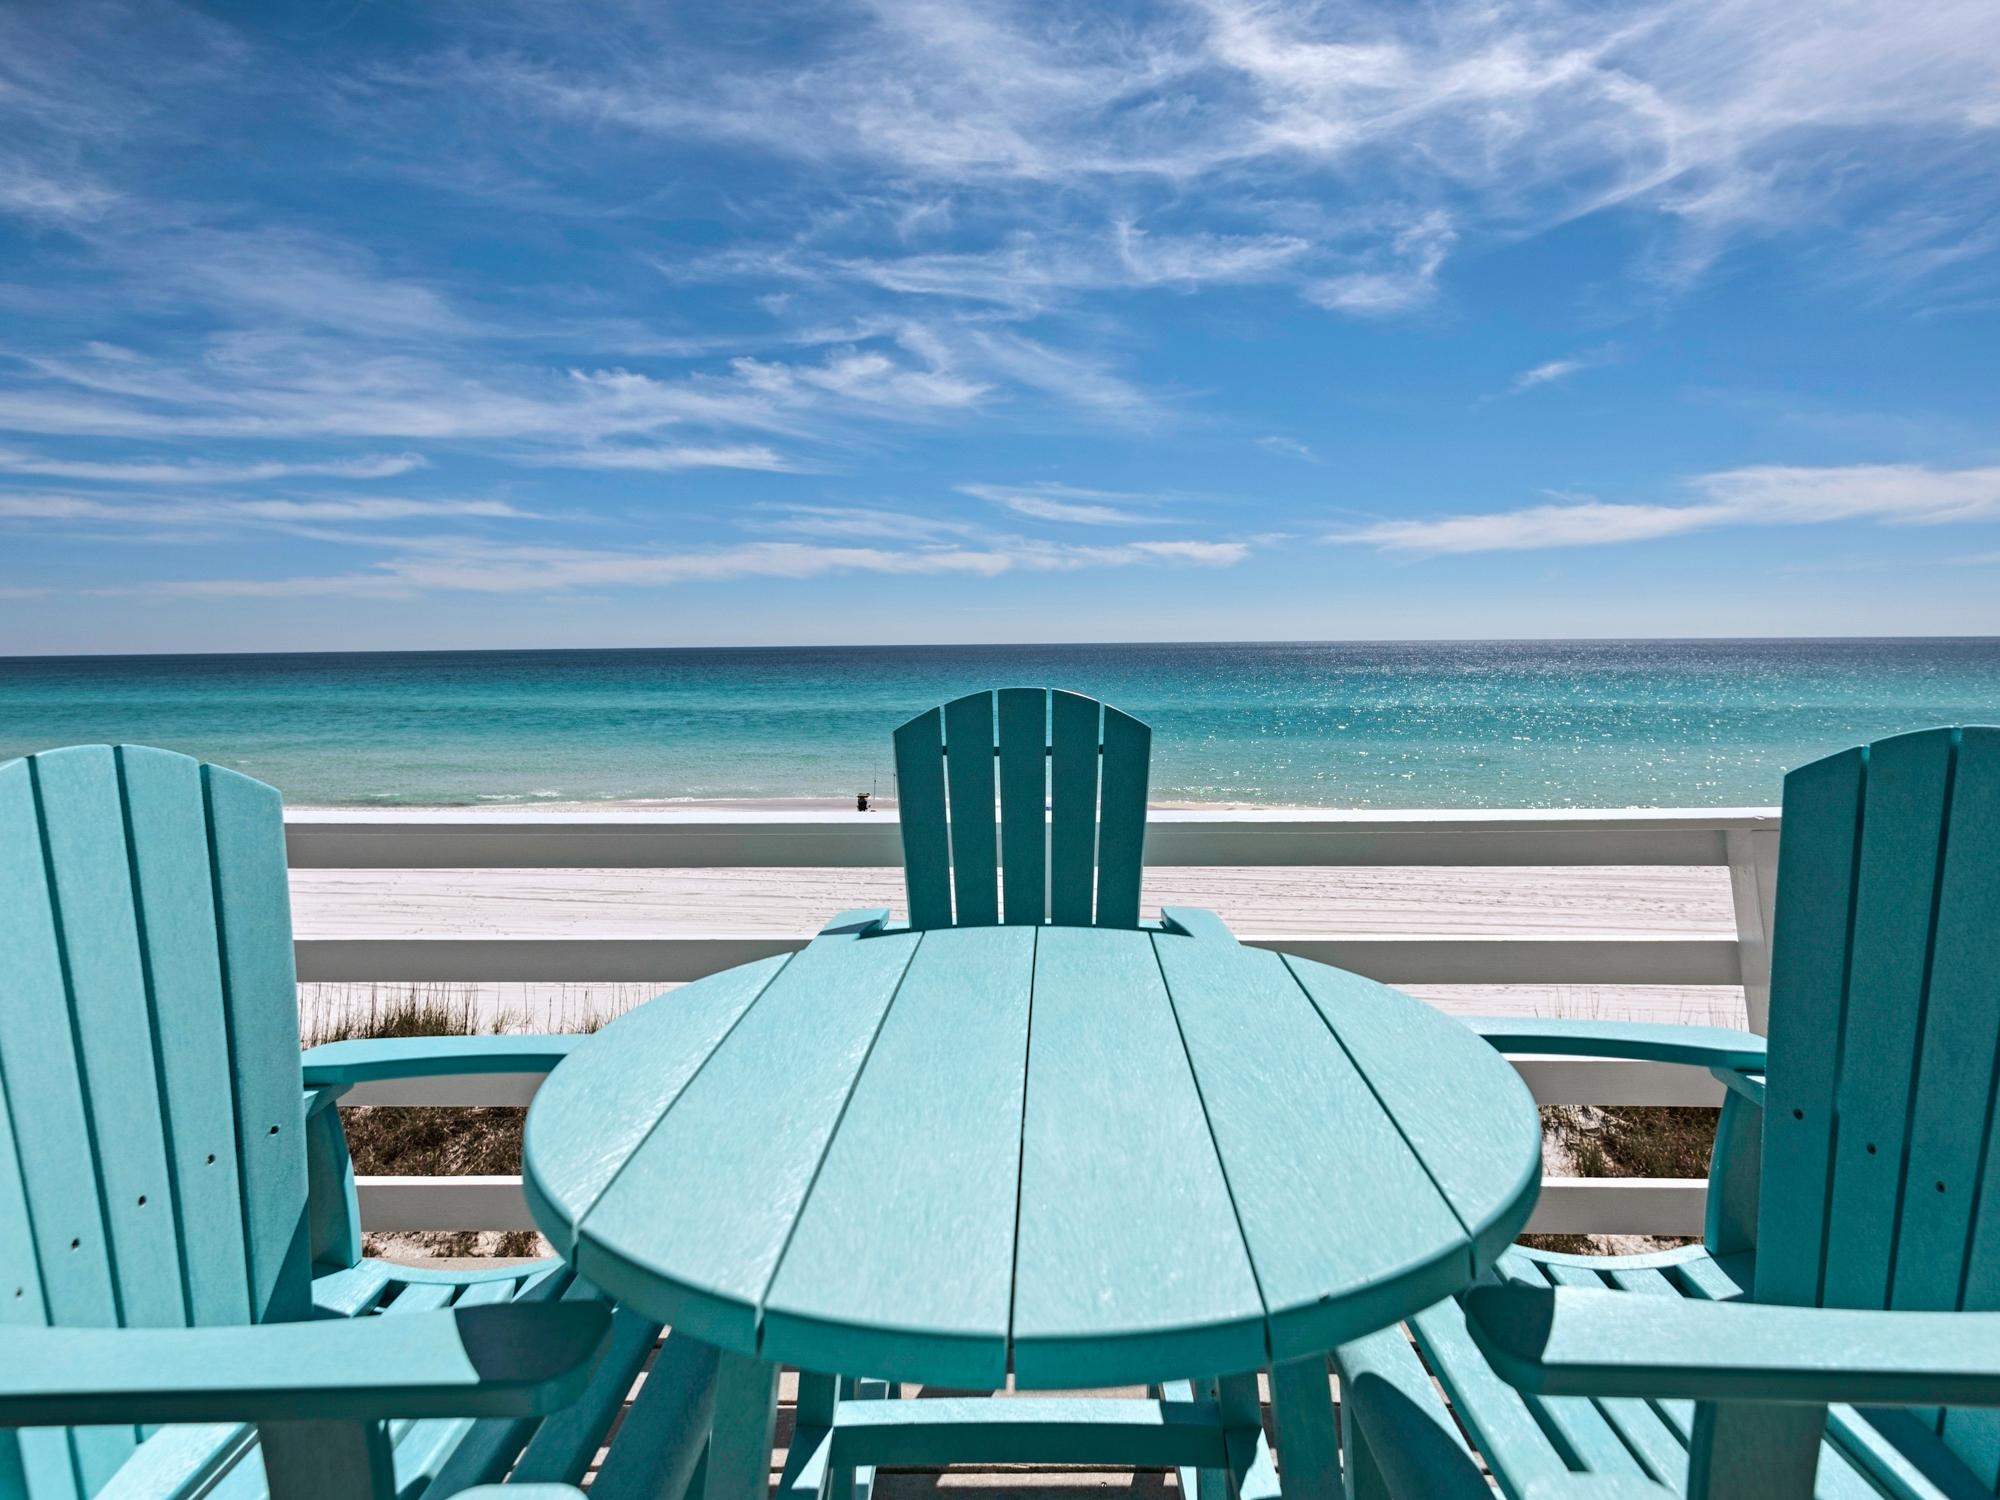 condo rentals places to stay florida s emerald coast rh emeraldcoastfl com